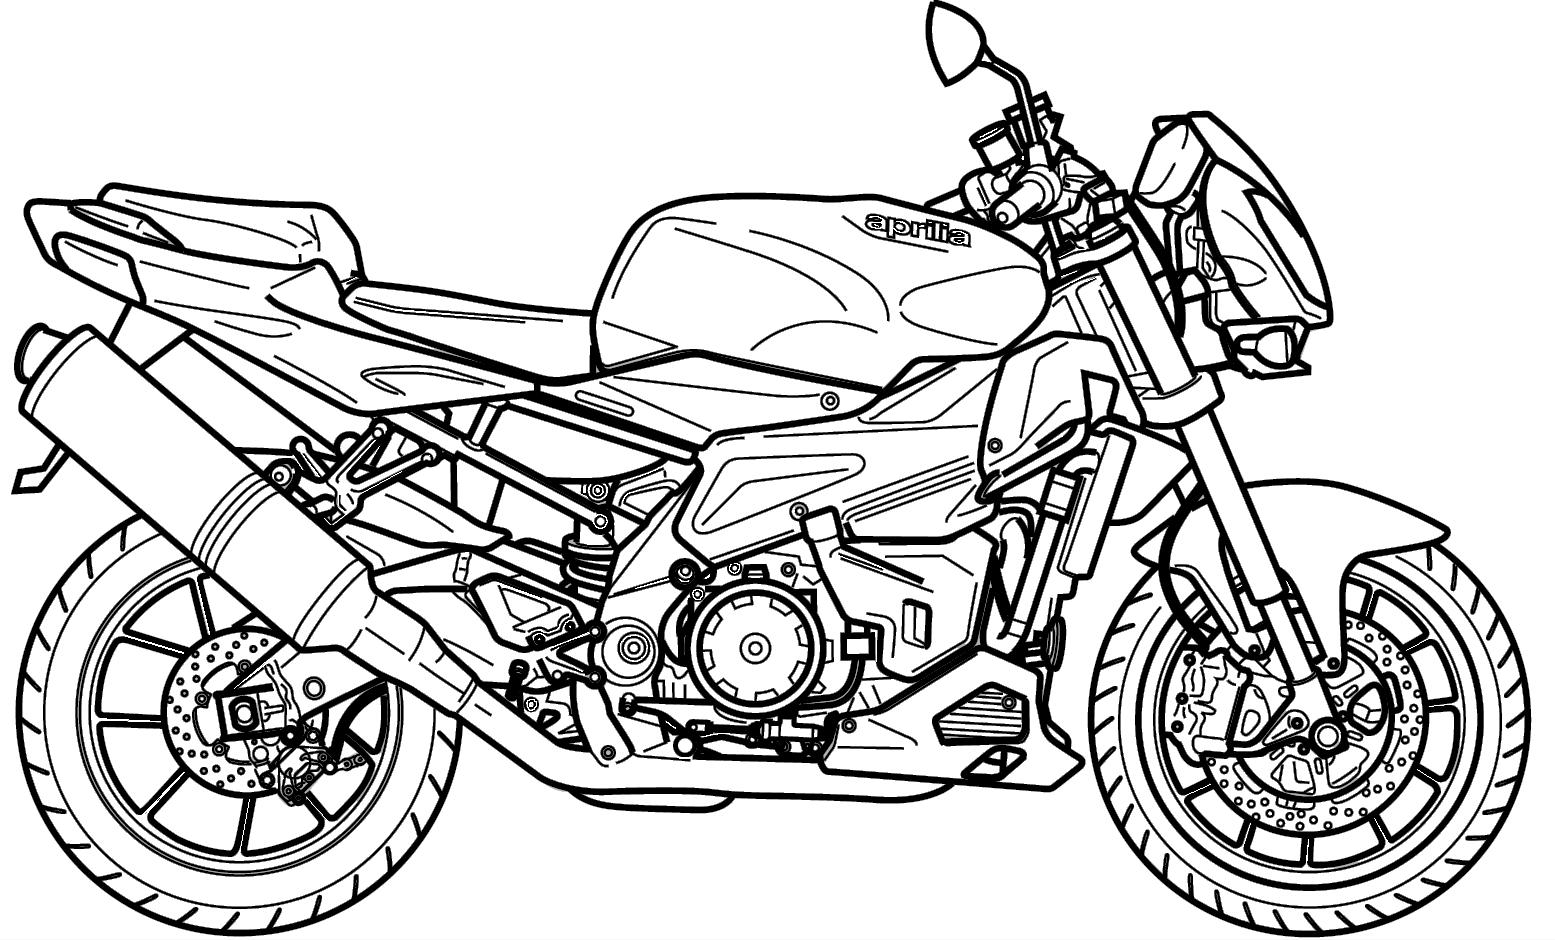 Desenhos Para Colorir Semana Do Transito Moto Xj6 Educacao E